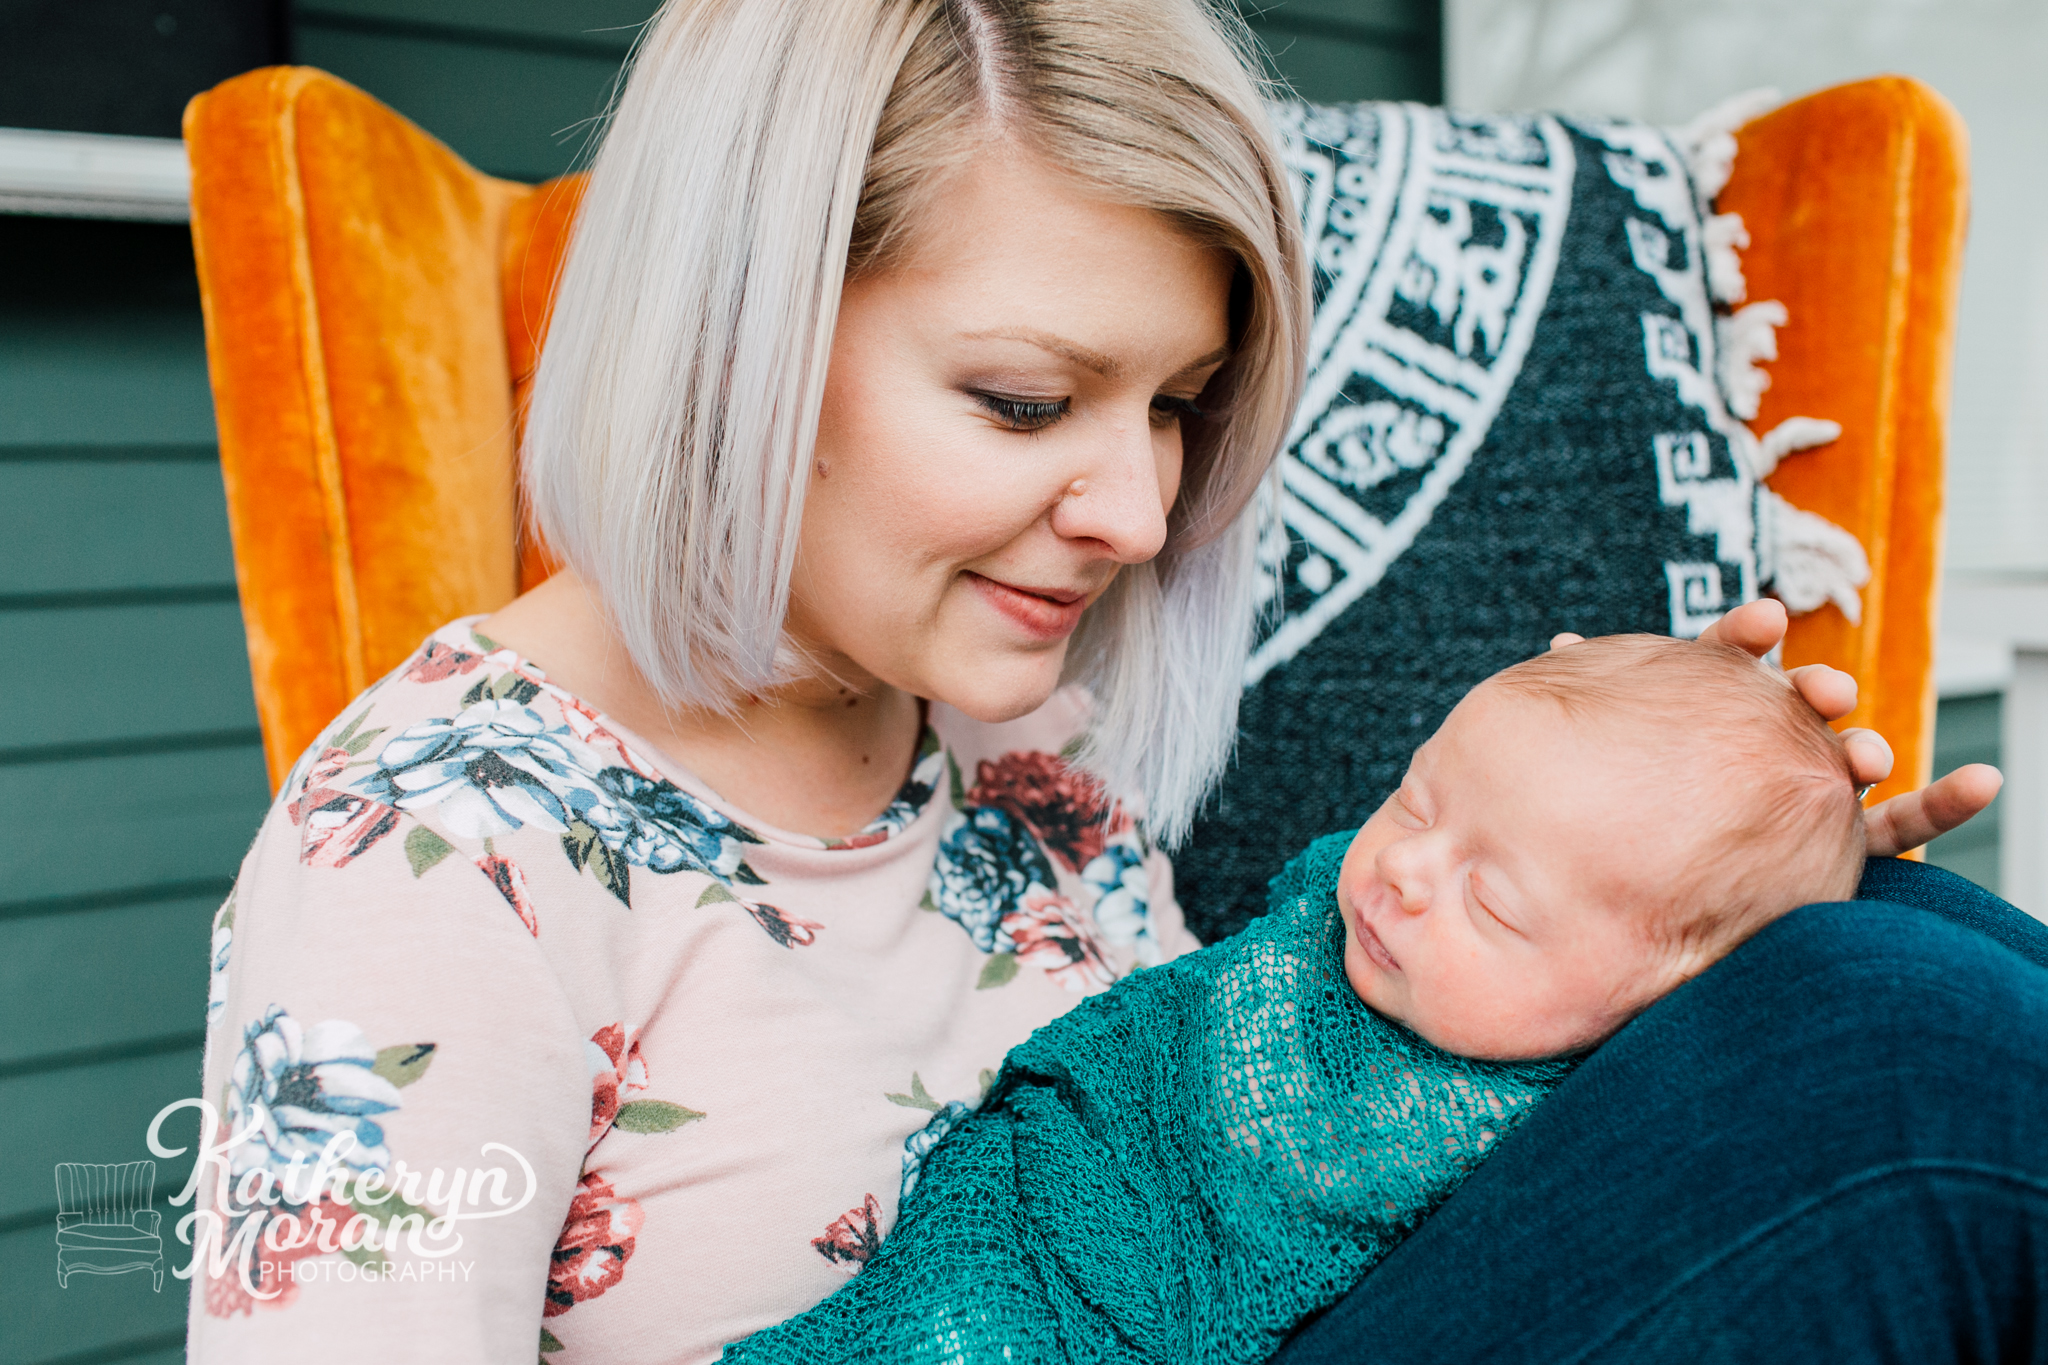 seattle-newborn-photographer-katheryn-moran-avery-malaspino-8.jpg